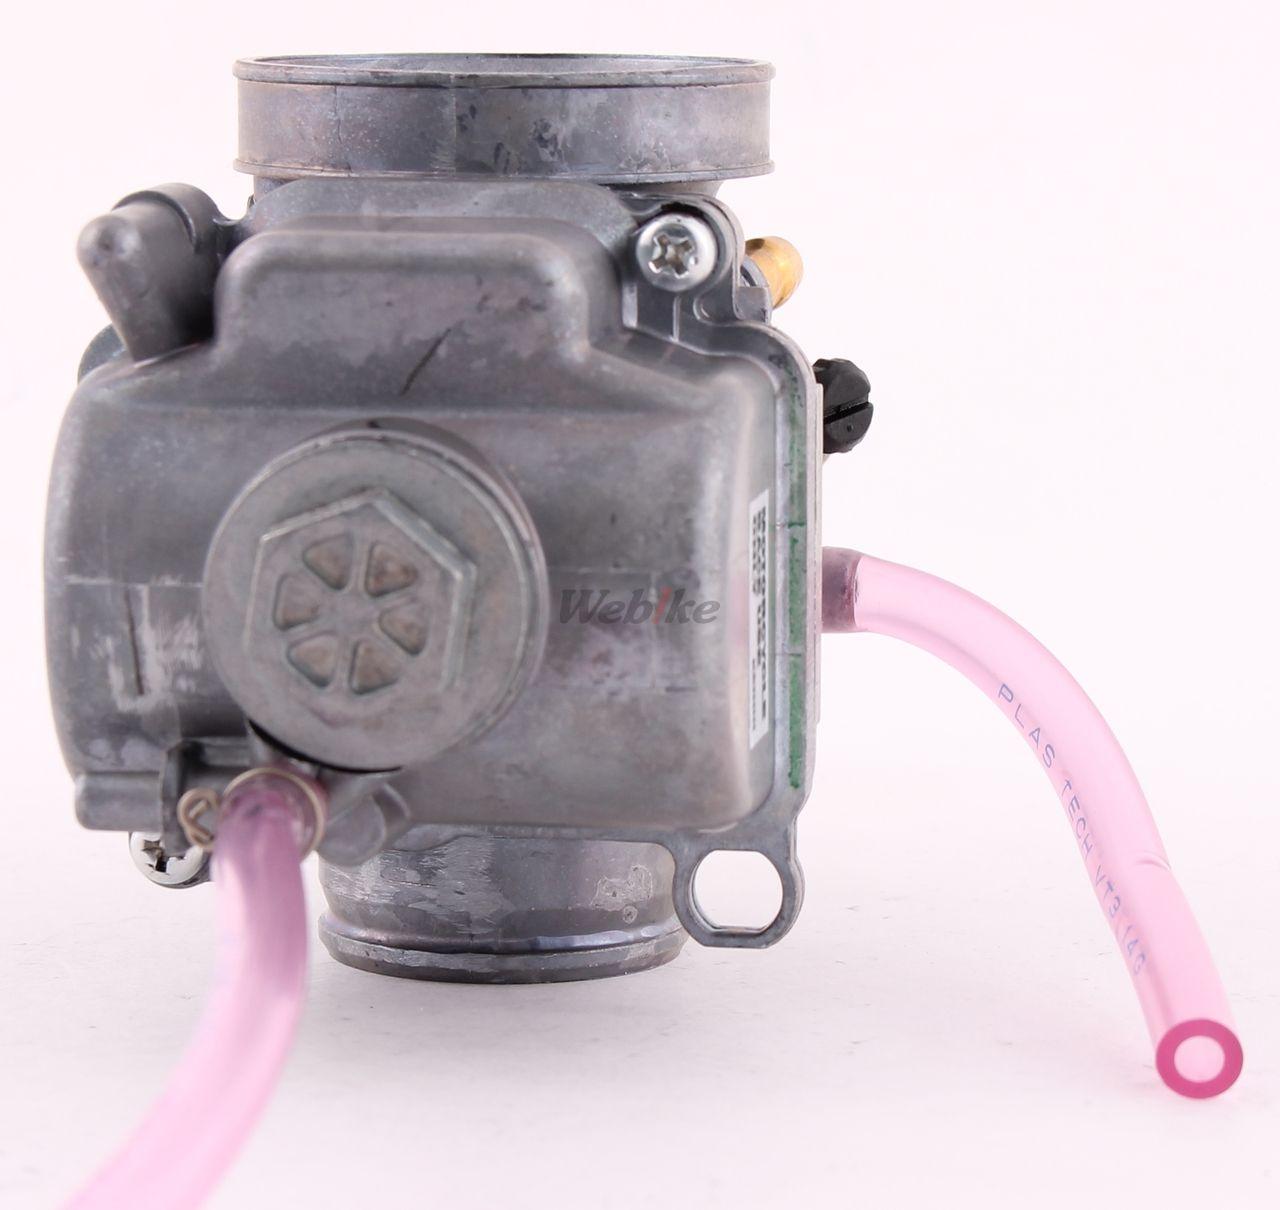 【KEIHIN】PWK化油器 - 「Webike-摩托百貨」